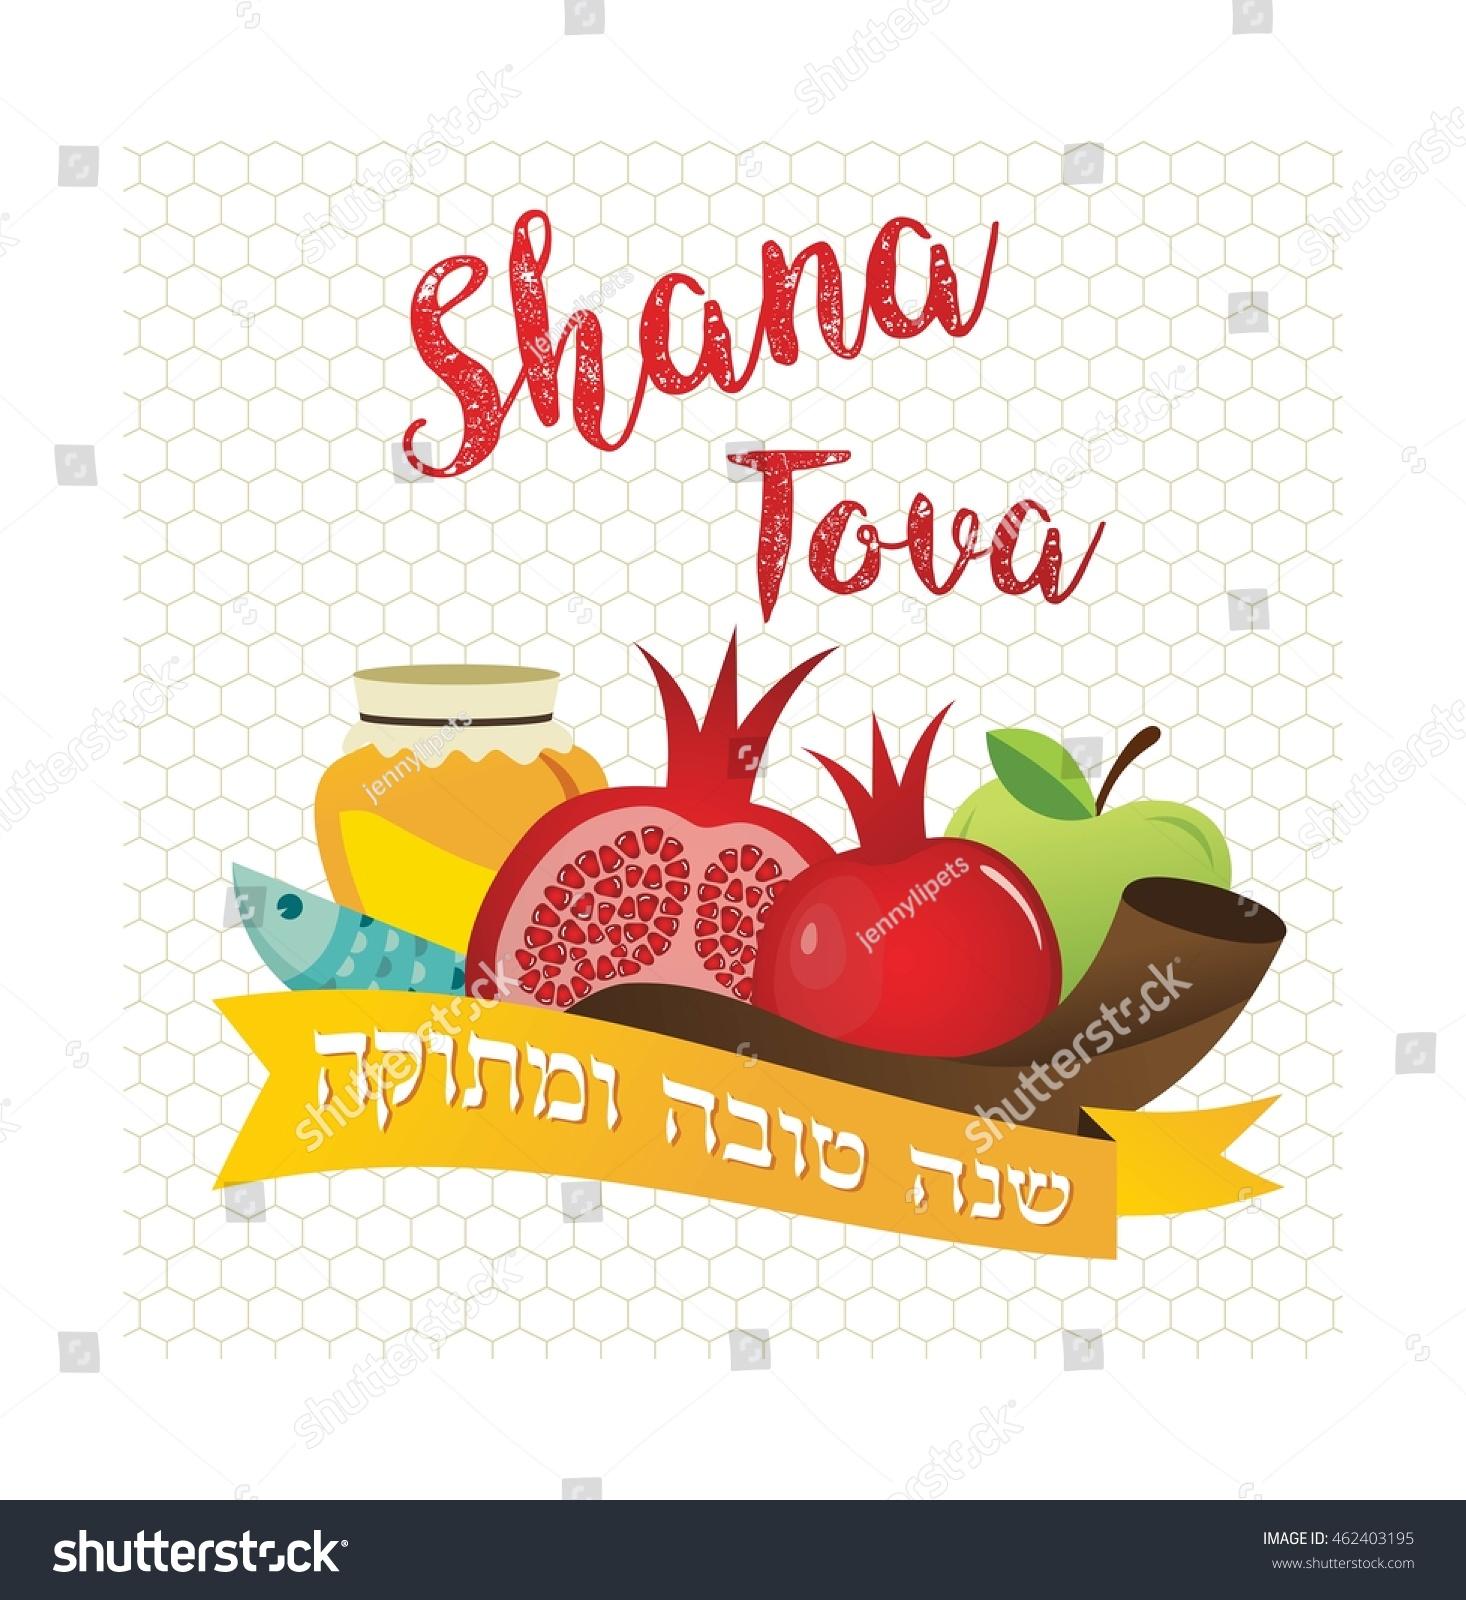 Symbols rosh hashanah jewish new year stock vector 462403195 symbols of rosh hashanah jewish new year happy holiday in hebrew biocorpaavc